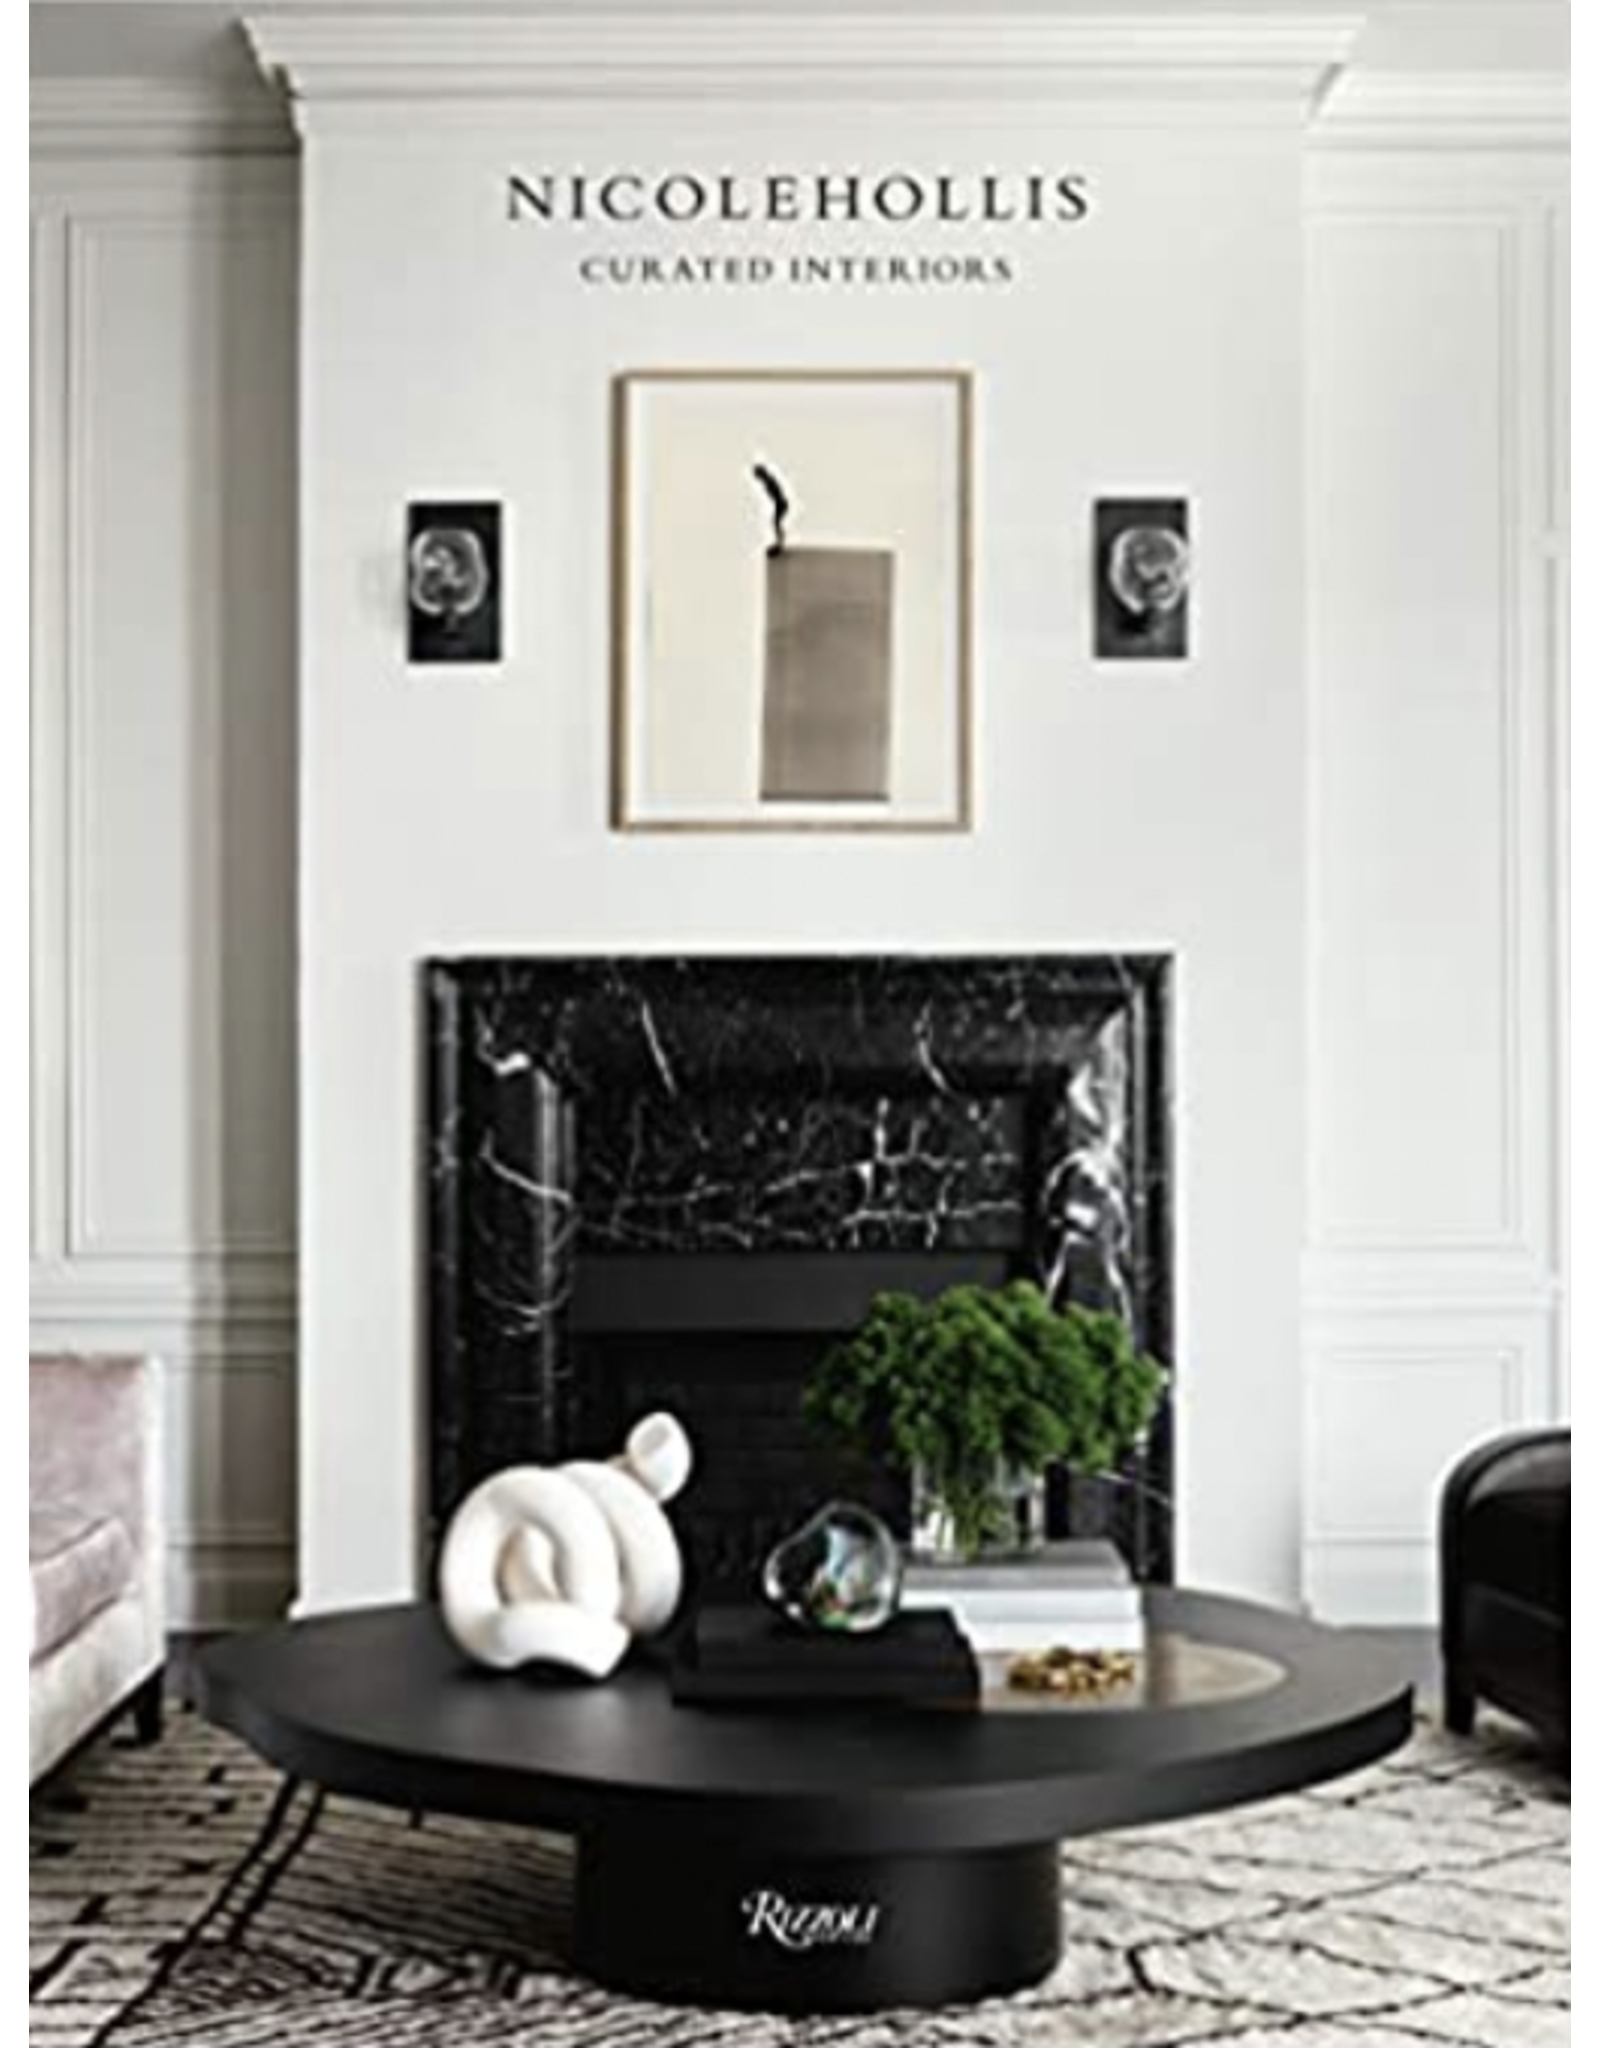 Website Nicolehollis: Interiors